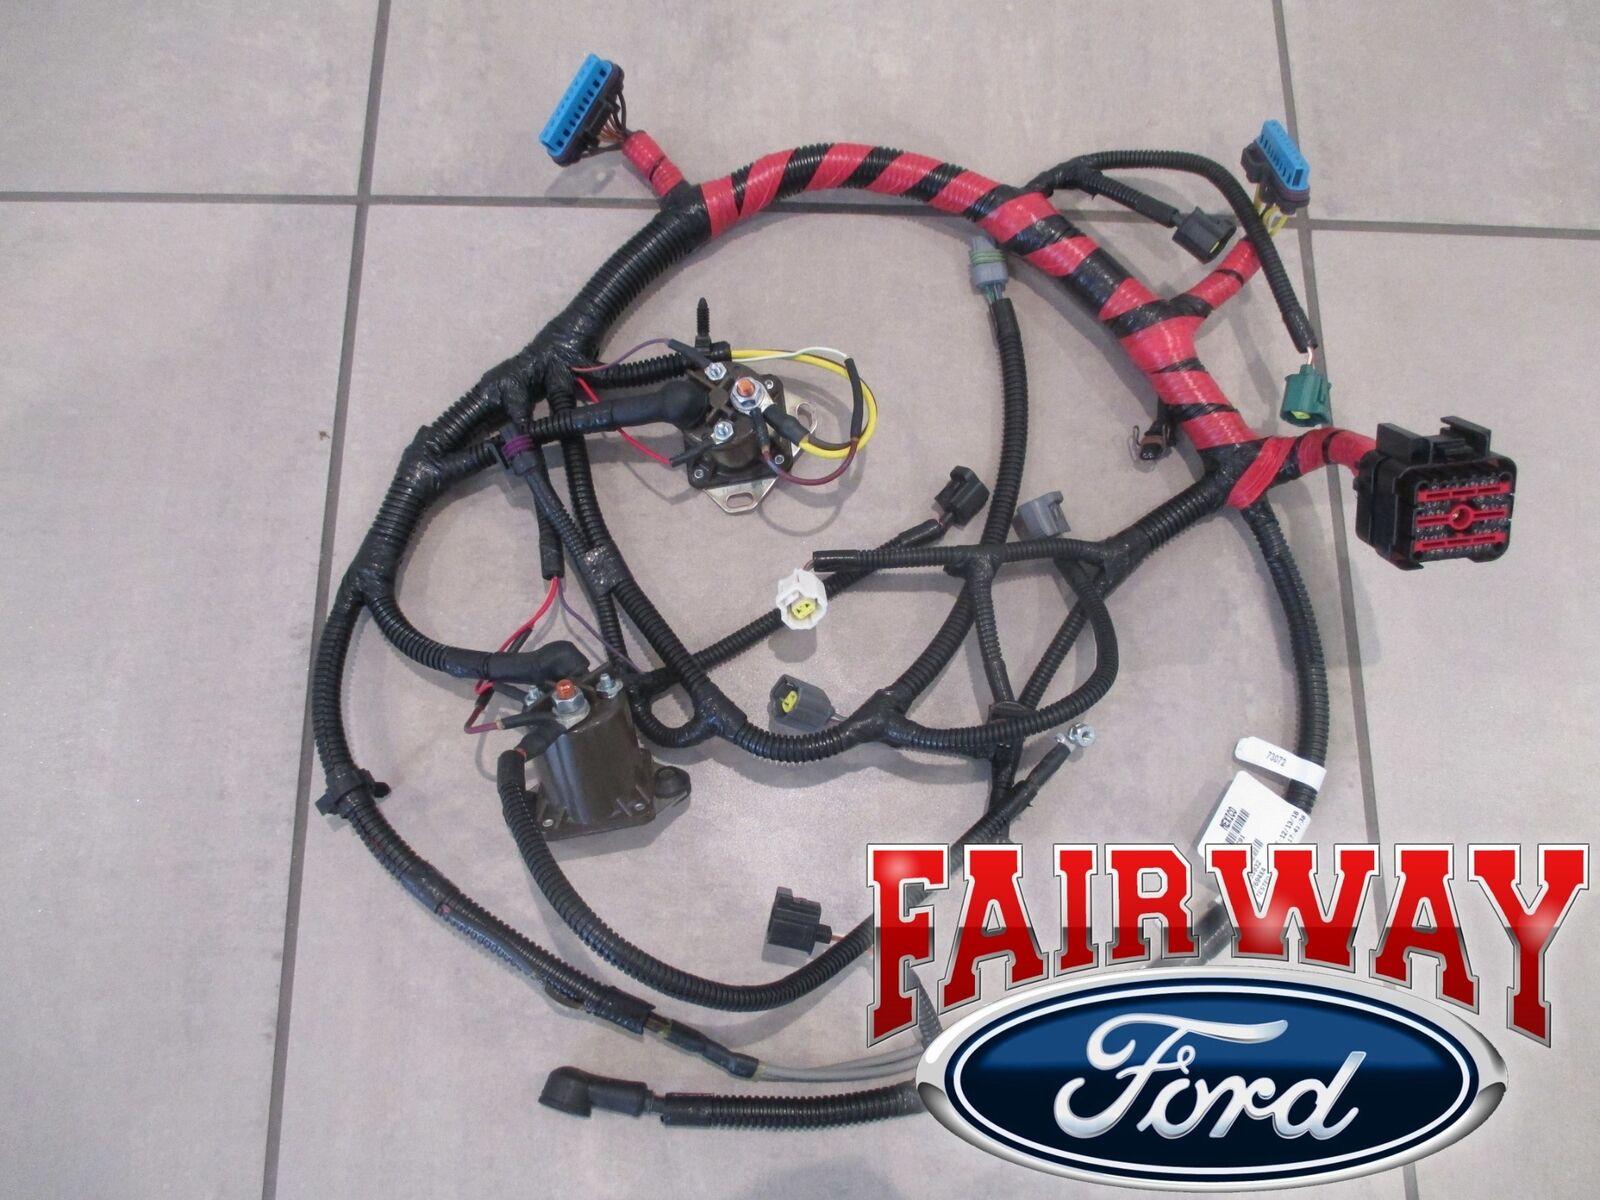 1998 super duty oem ford upper engine wiring harness 7.3l diesel for sale  online | ebay  ebay